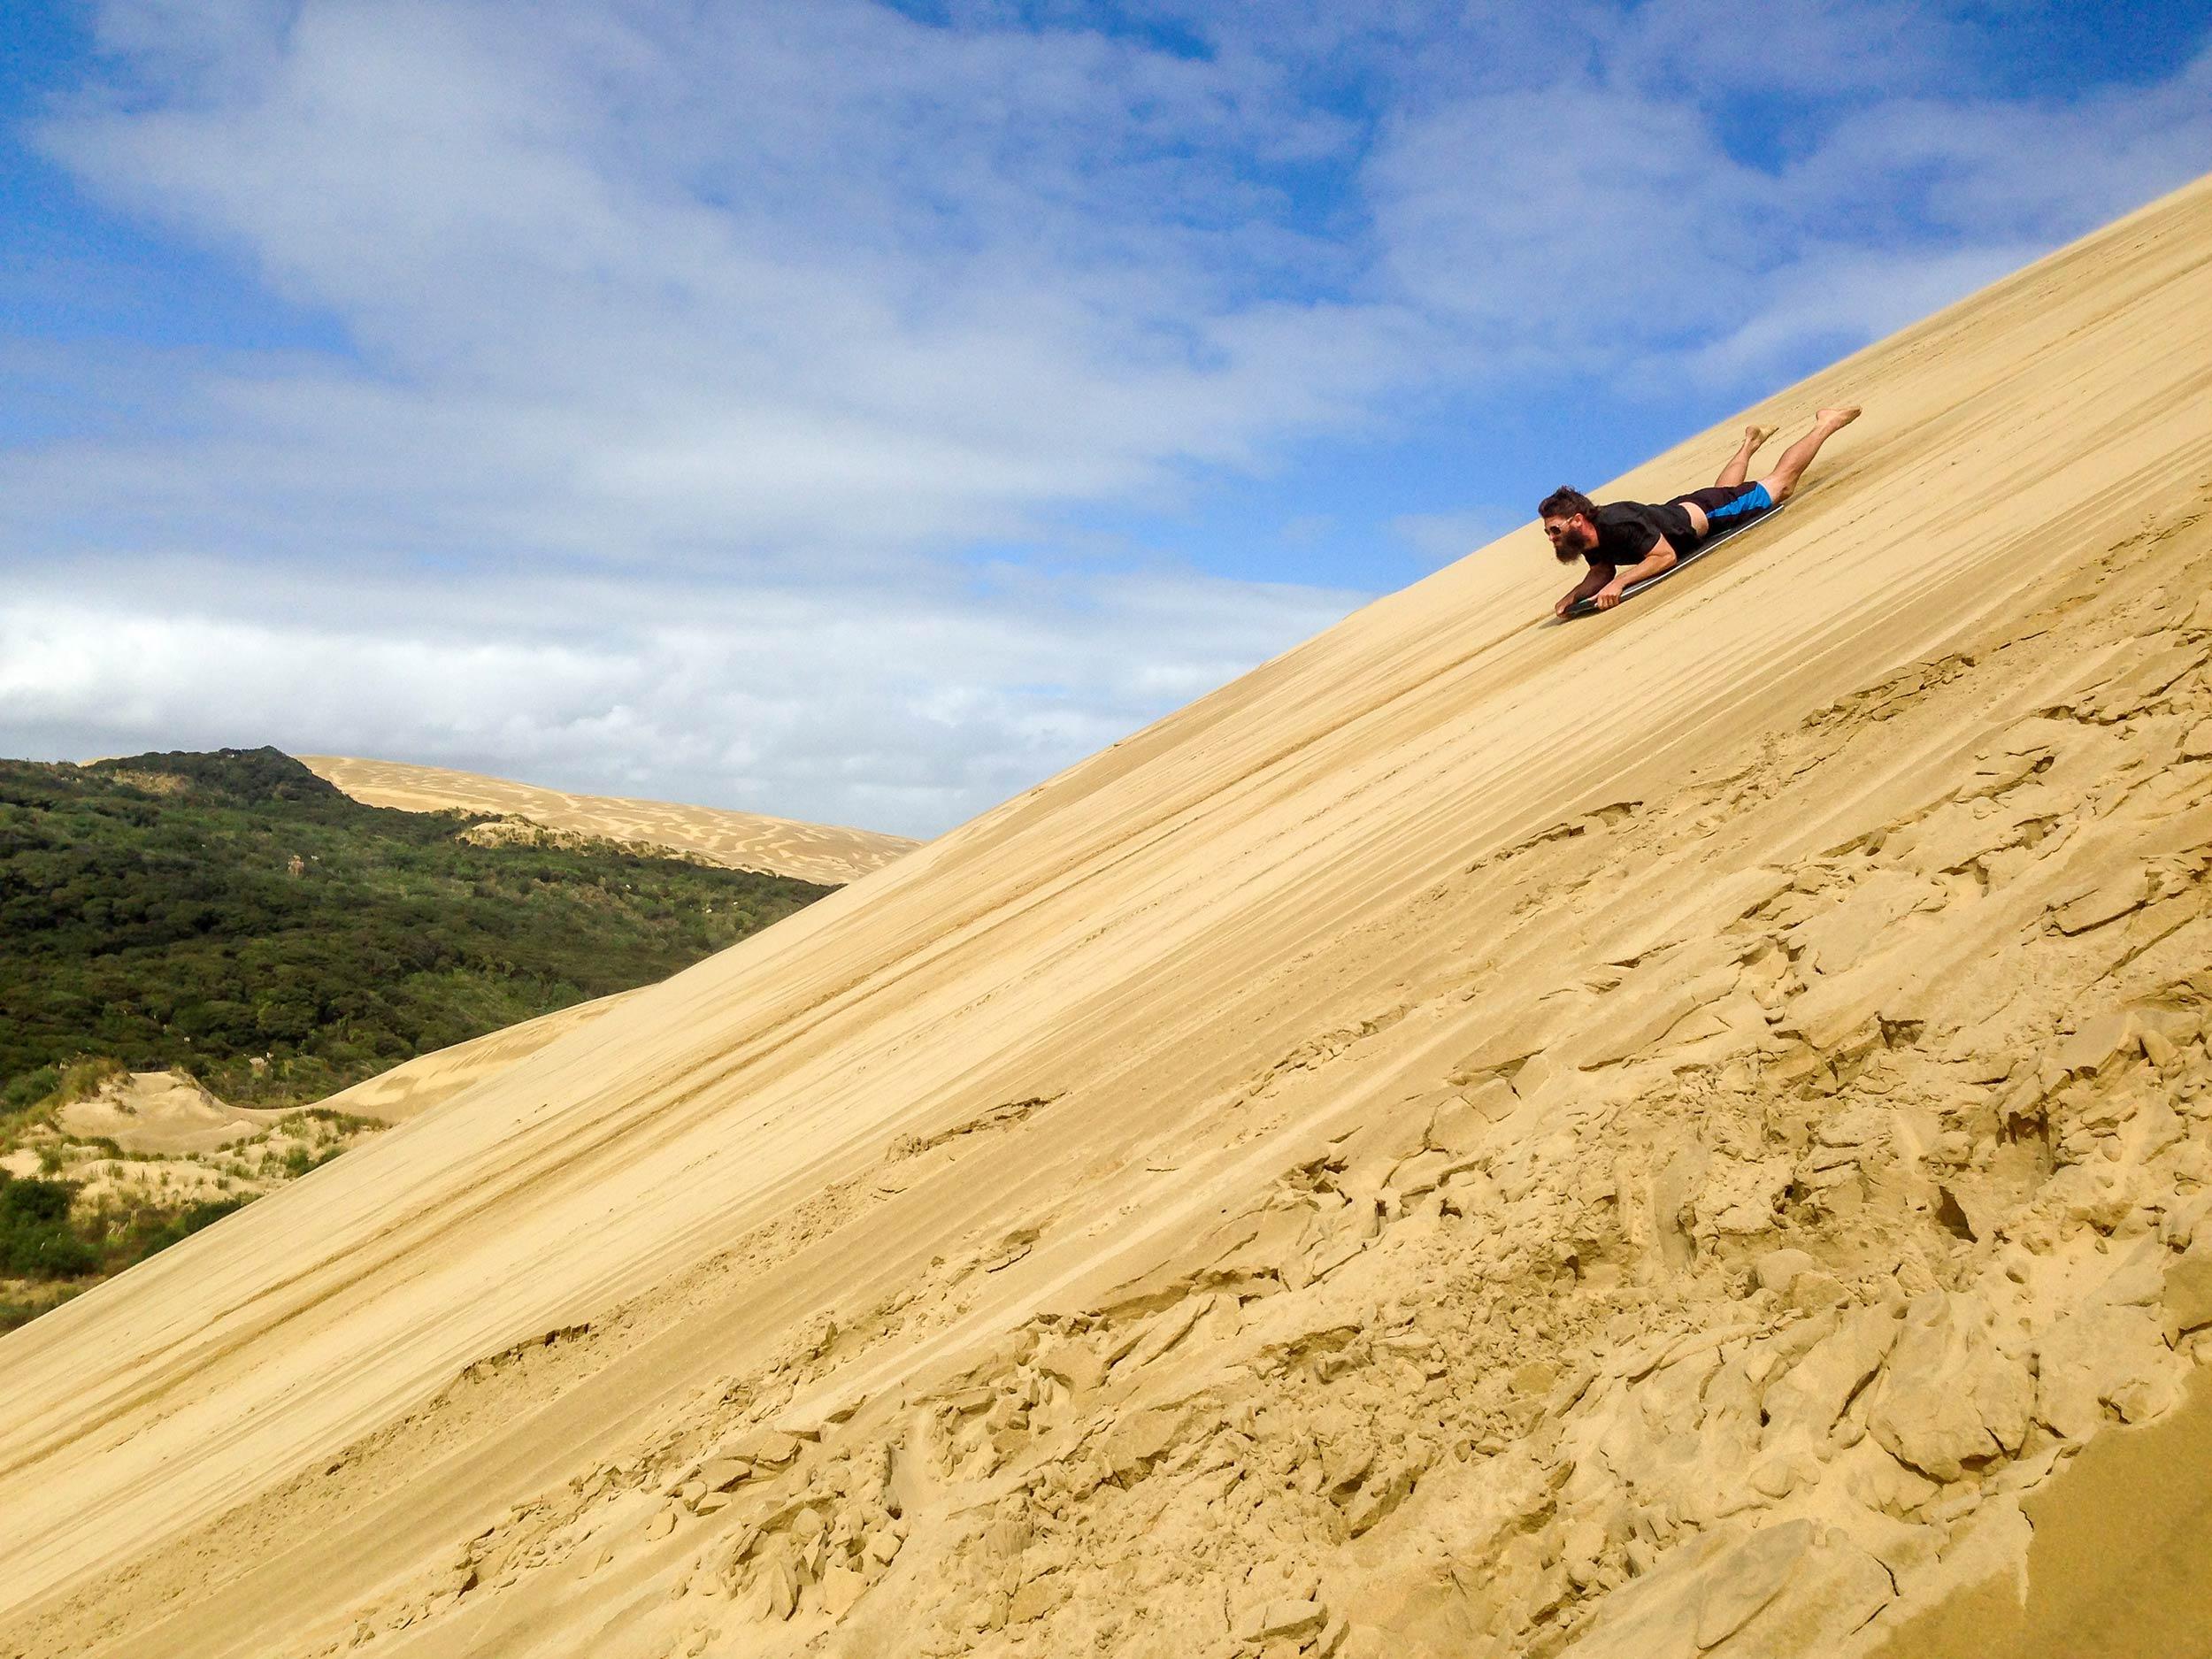 te_paki_sand_dunes_jordan_slide.jpg